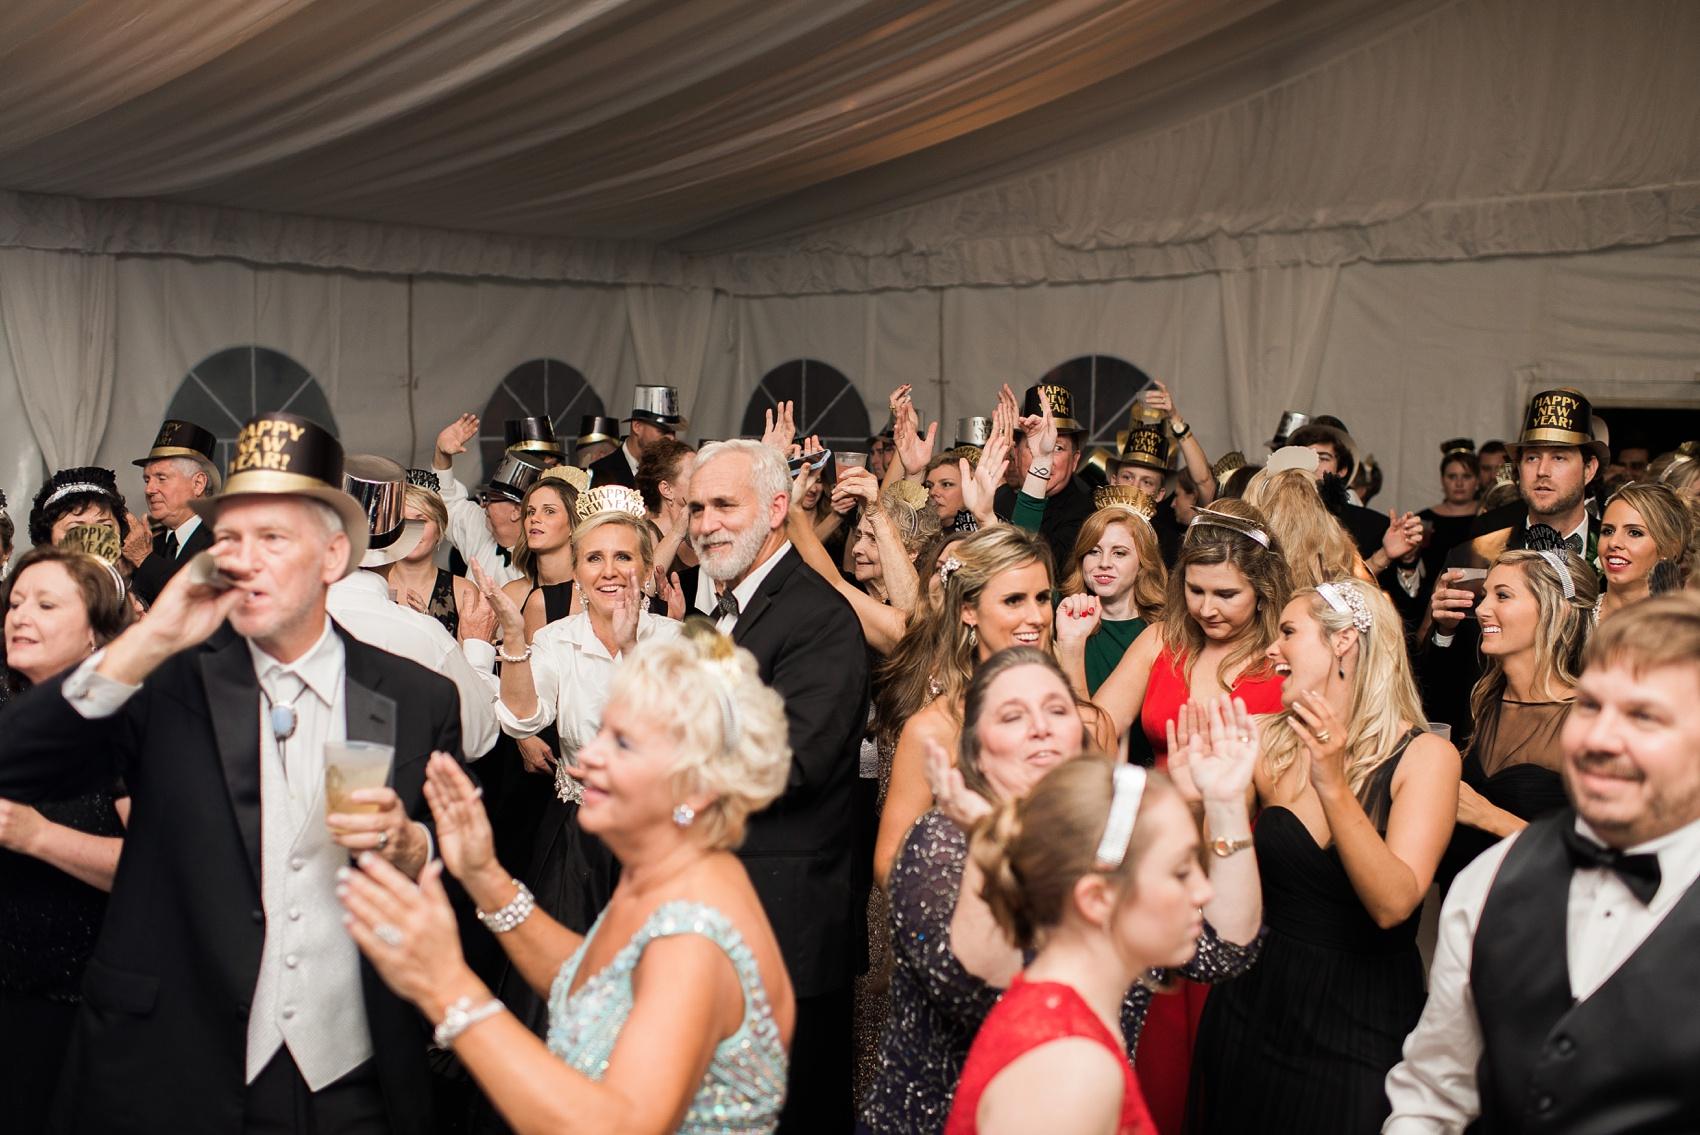 South_carolina_wedding_photographer_0122.jpg